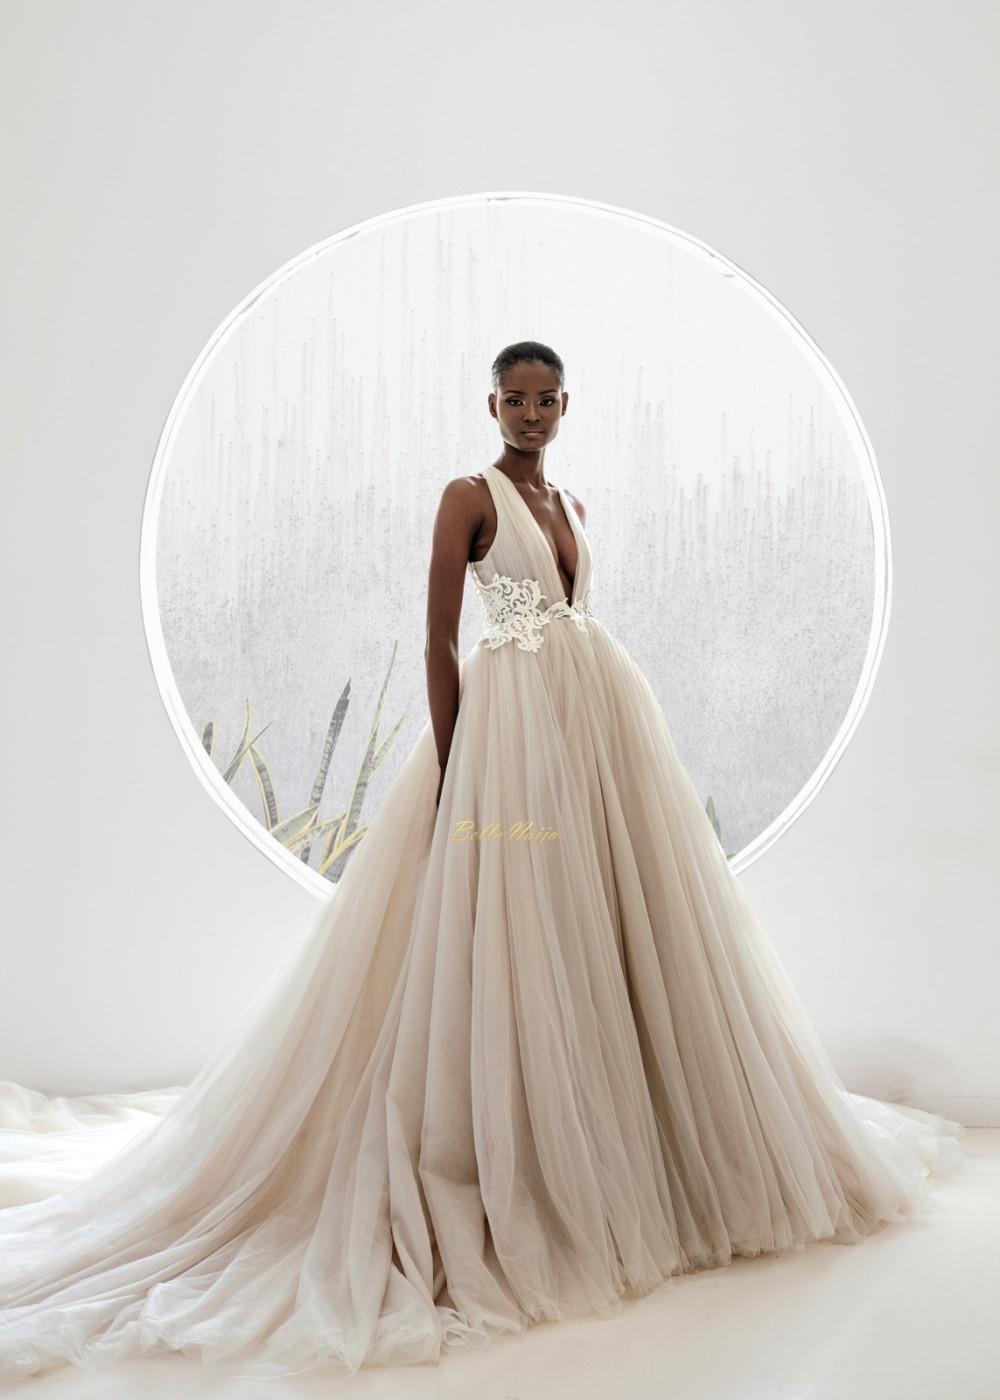 Wedding Dress Steamer 29 Unique The Andrea Iyamah bridal